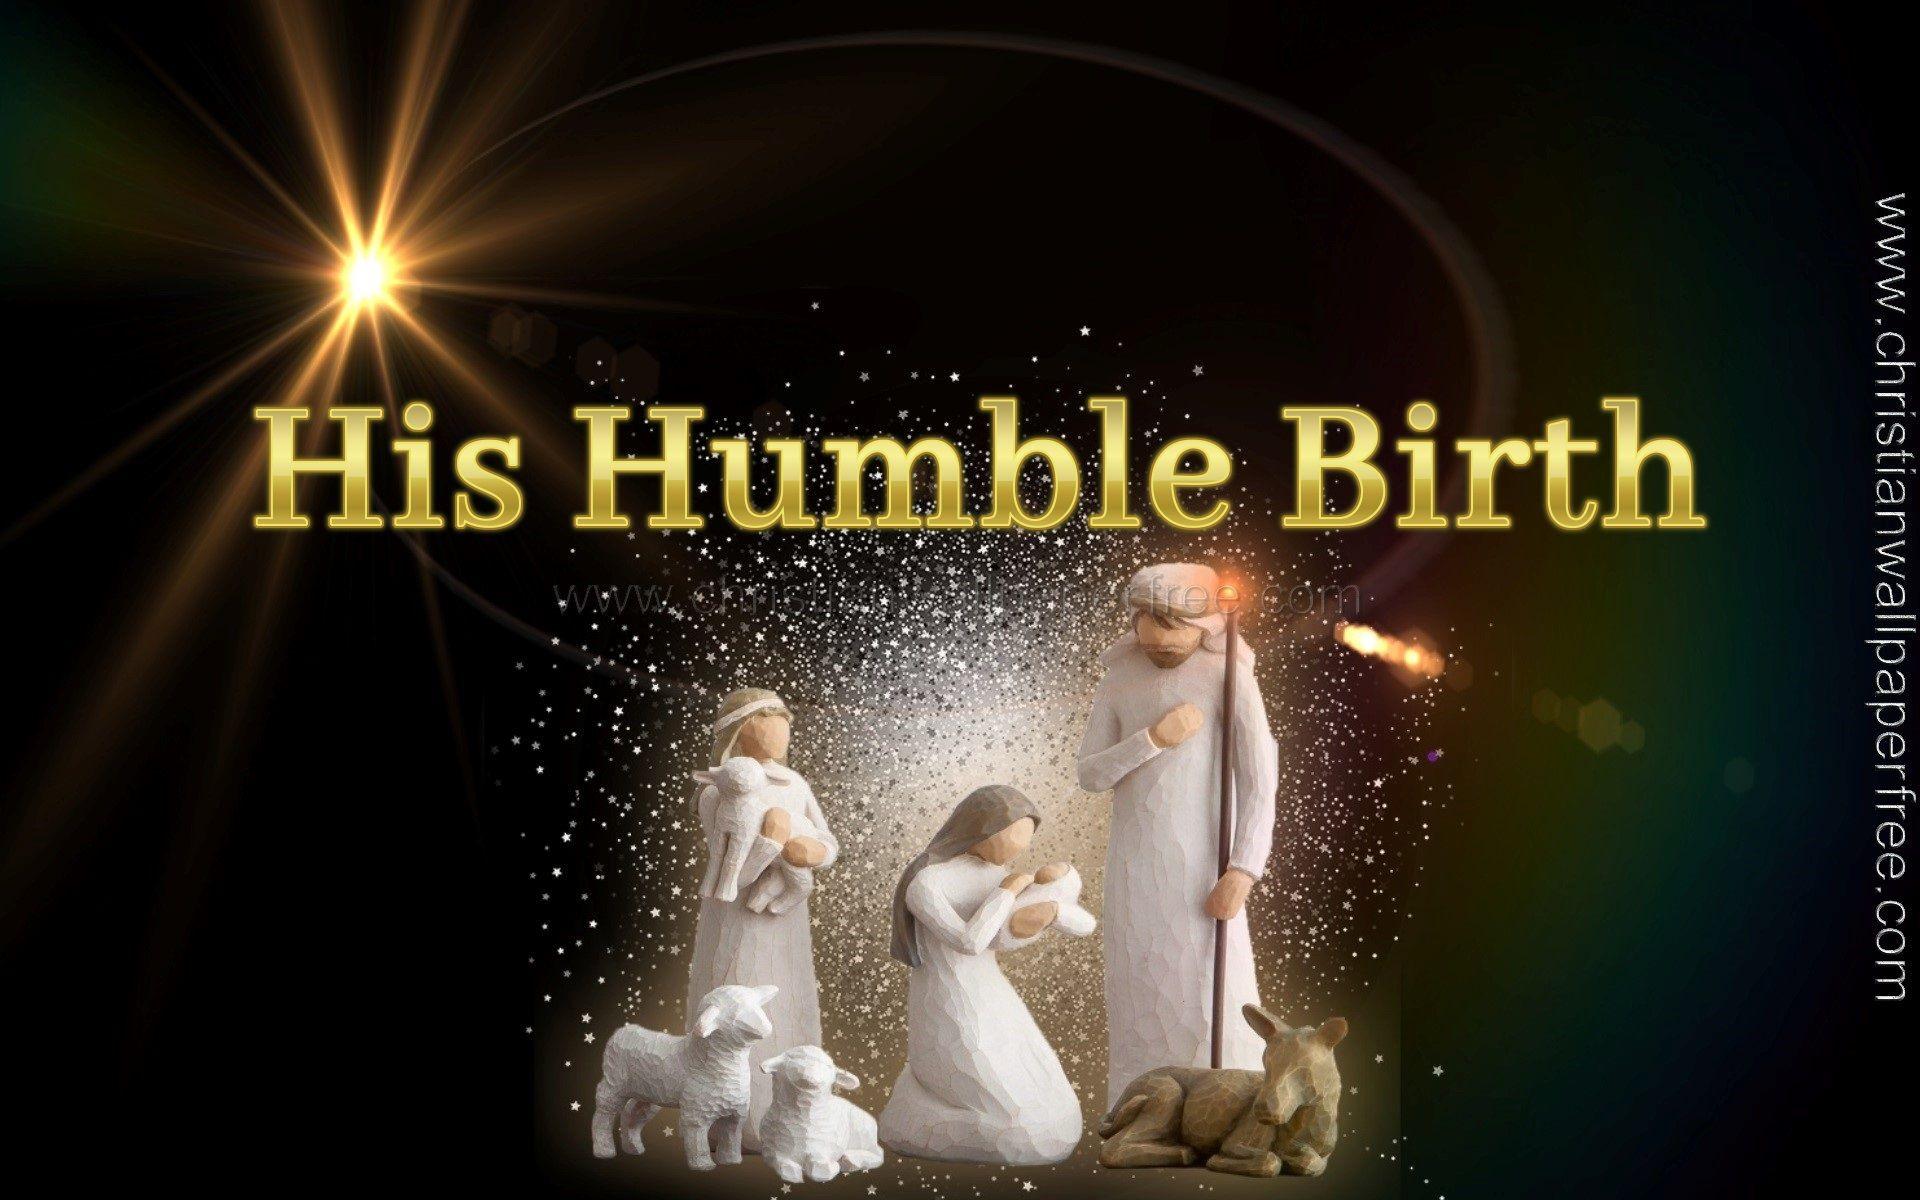 His Humble Birth Christian Wallpaper Christmas Wallpaper Free Free Christian Wallpaper